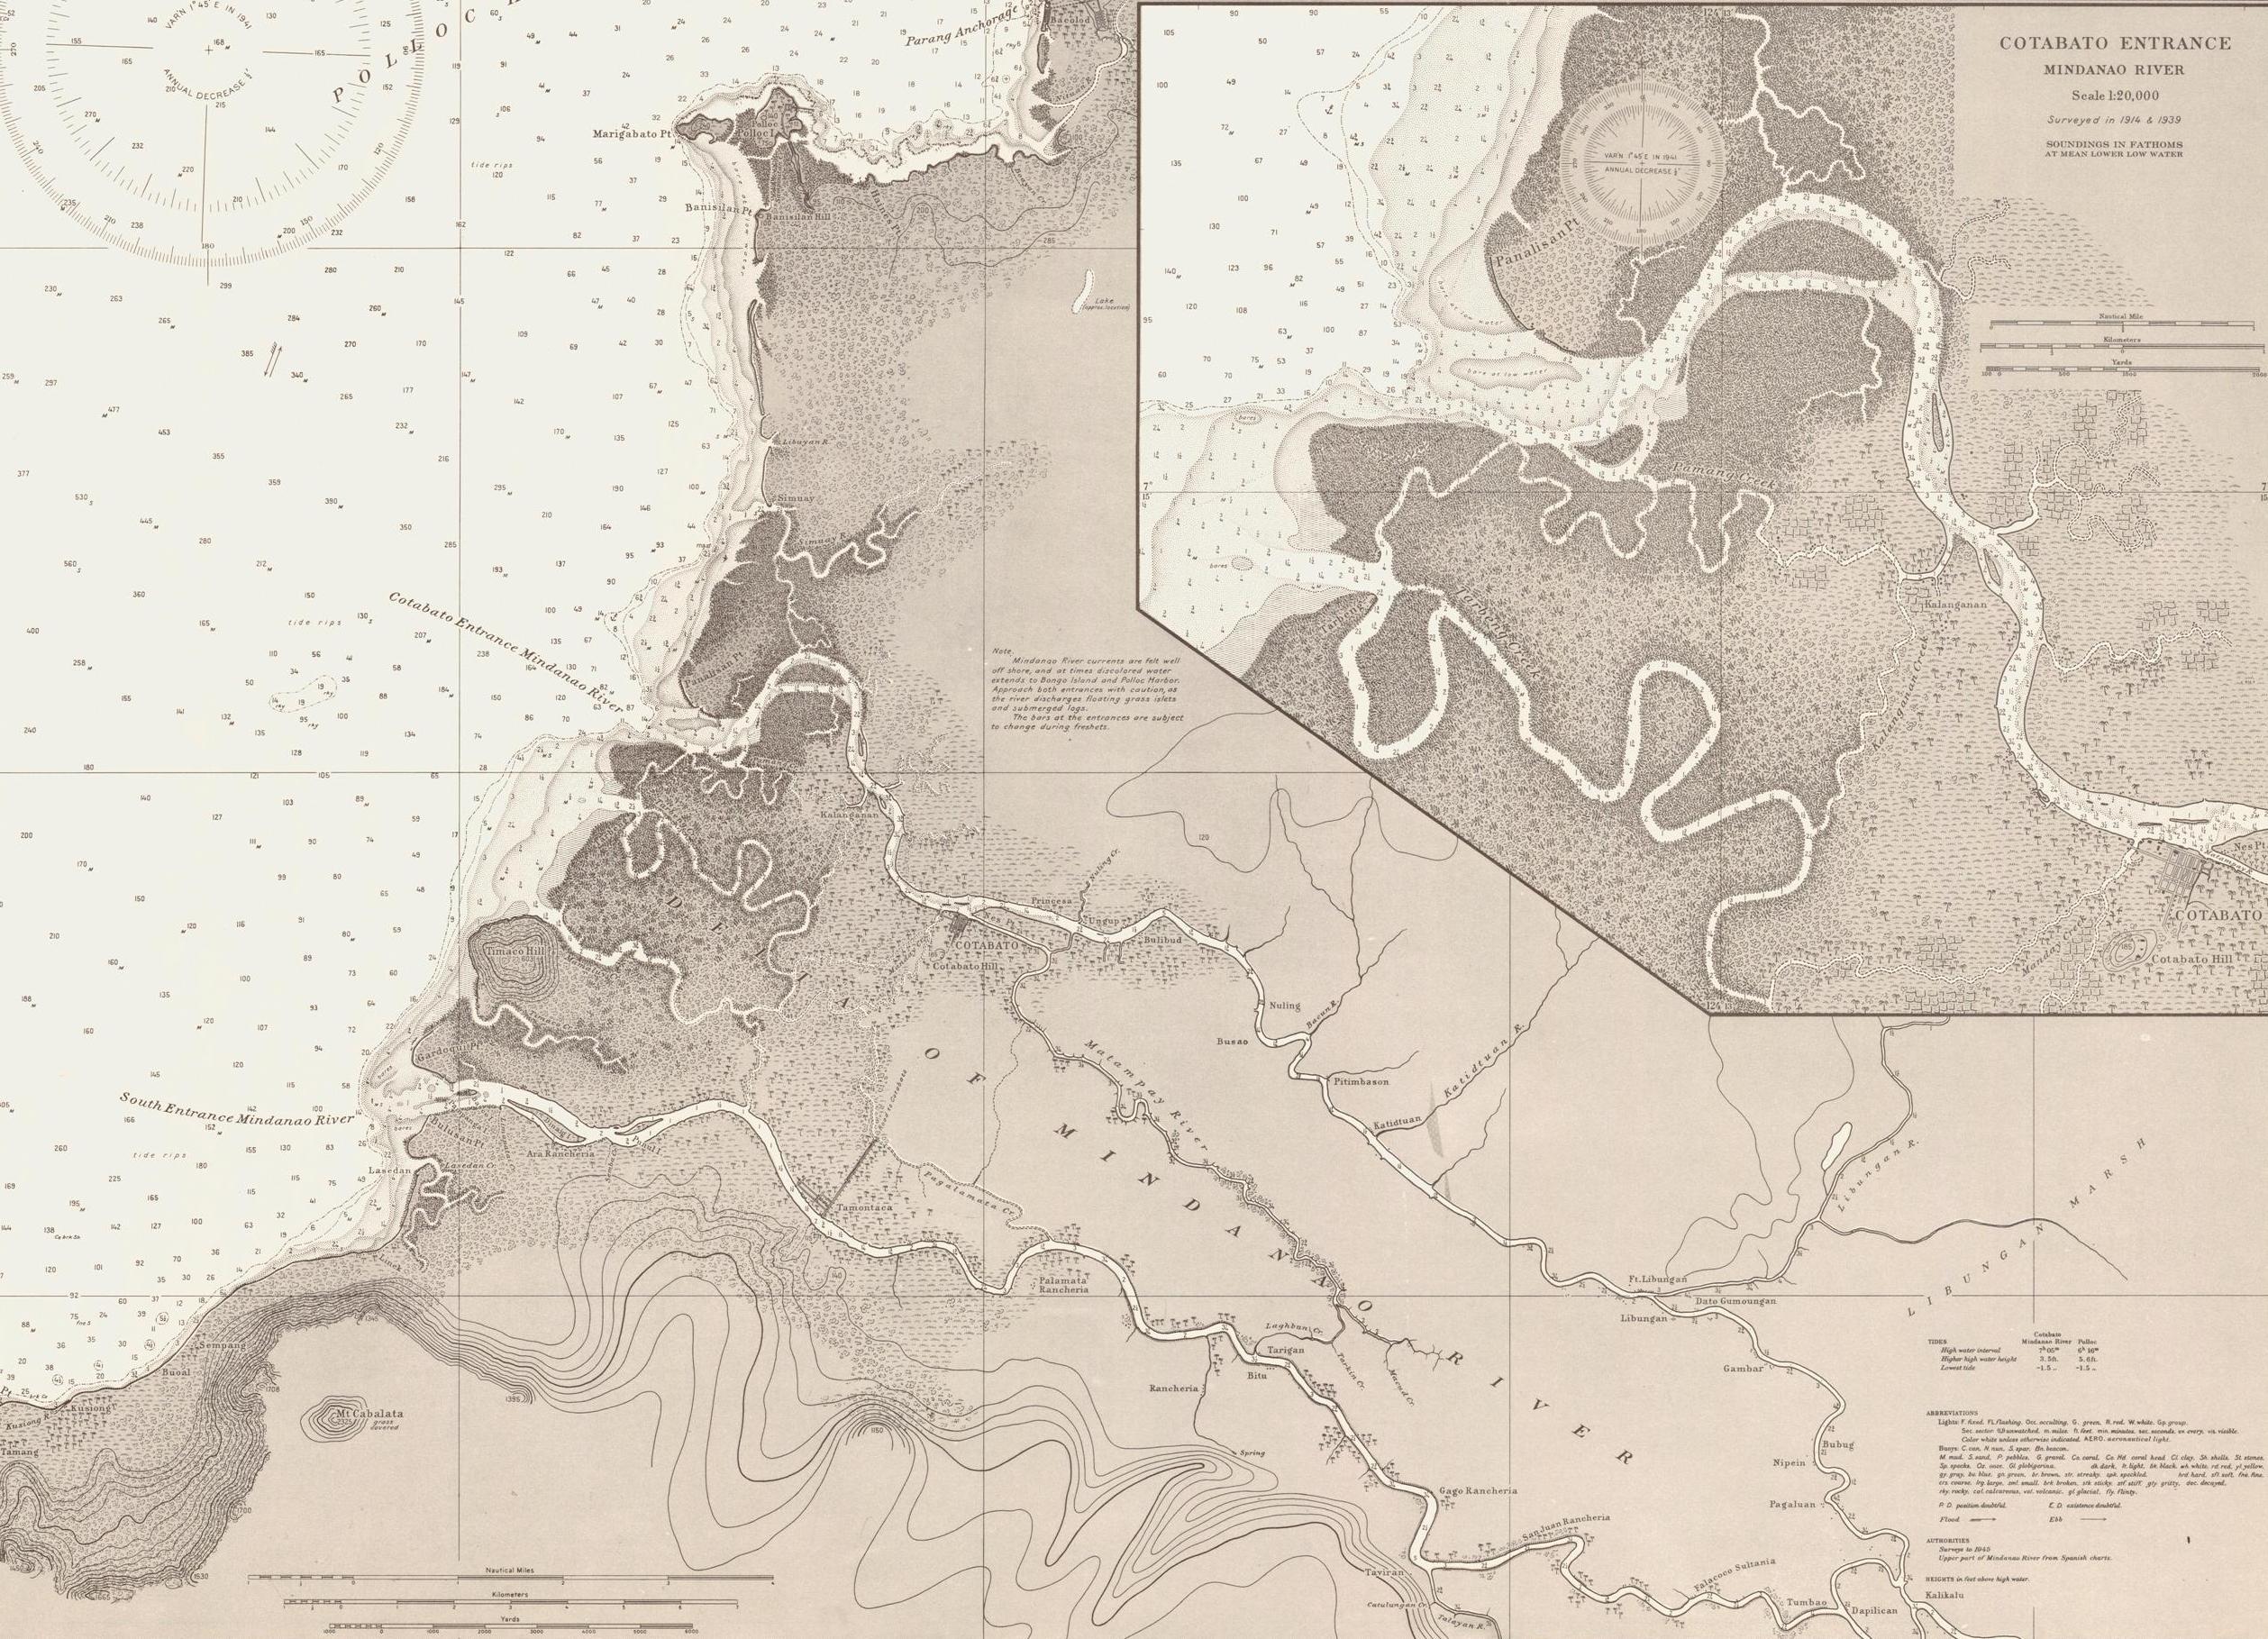 file mindanao river delta jpg wikimedia commons